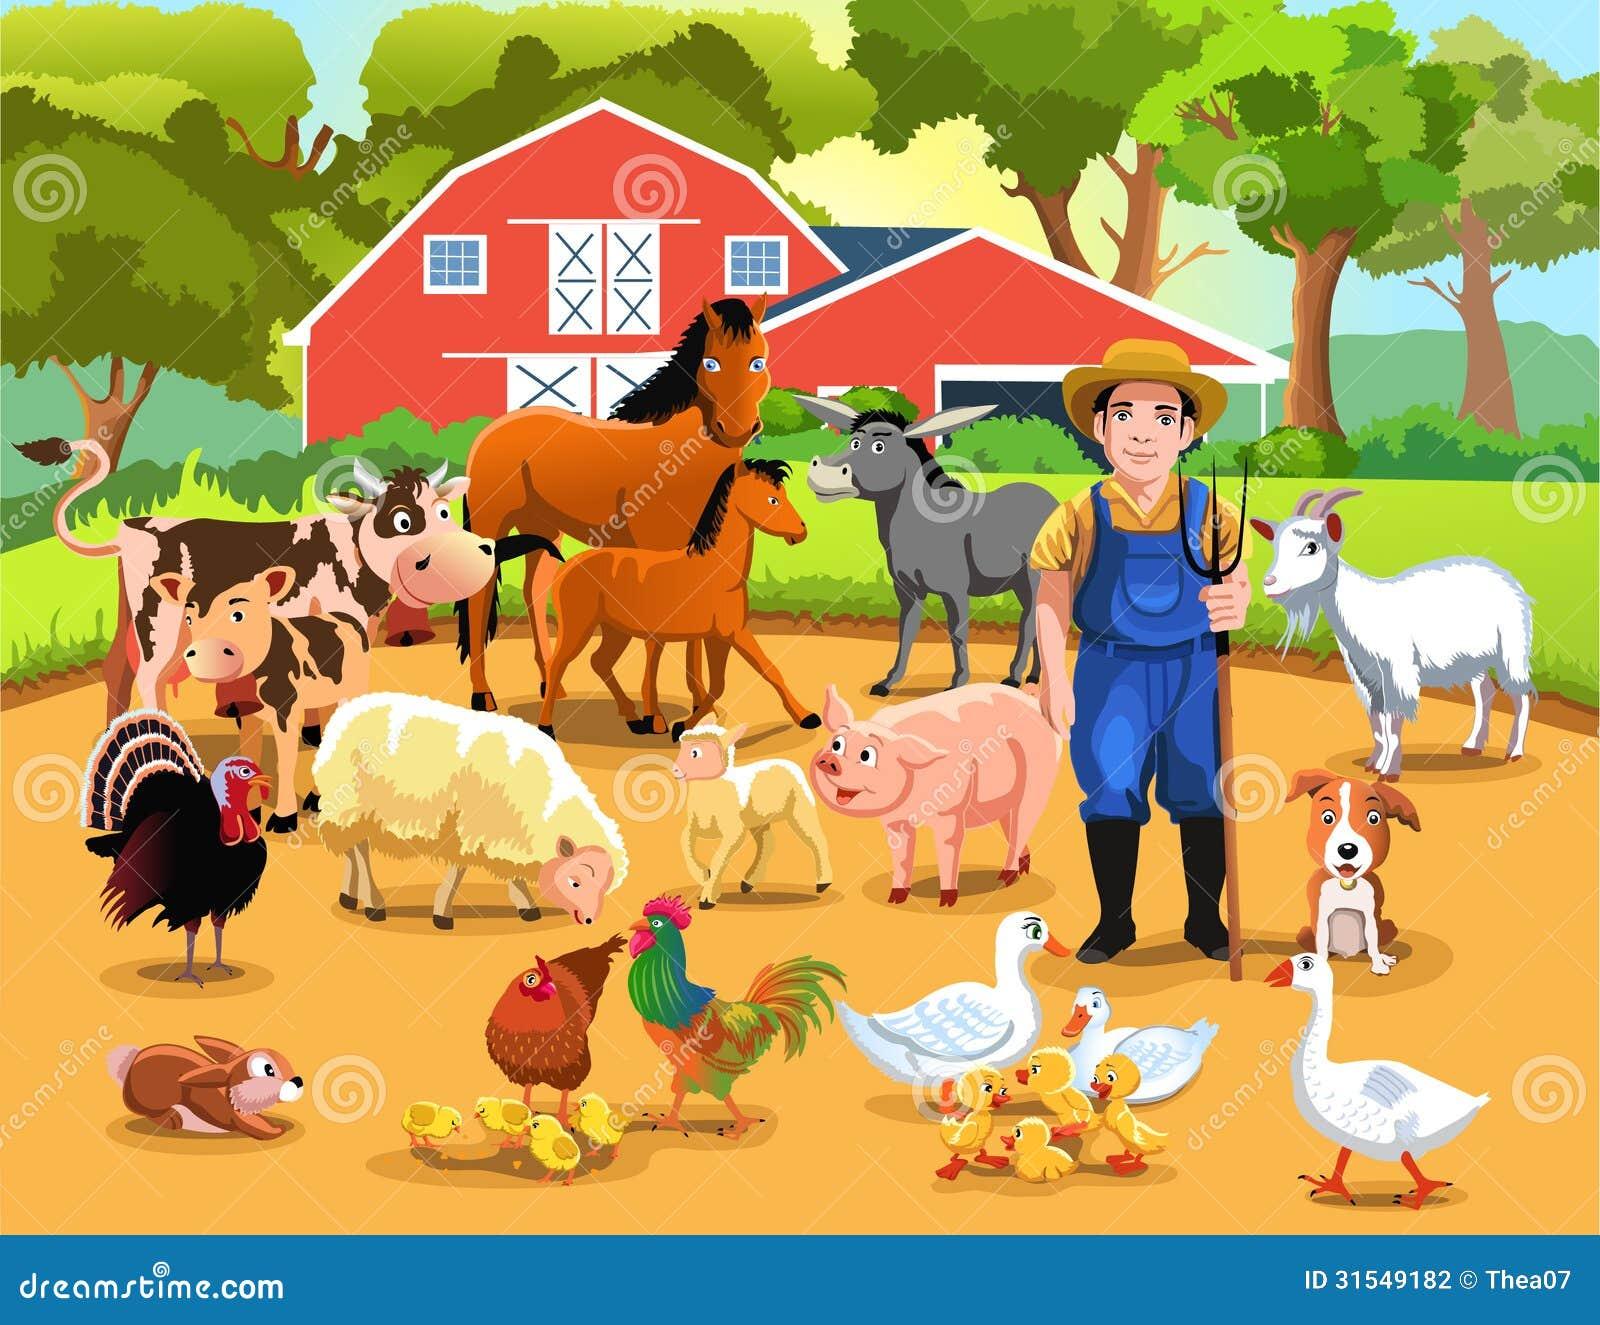 Life on the farm stock photography image 31549182 - Parador de la granja fotos ...